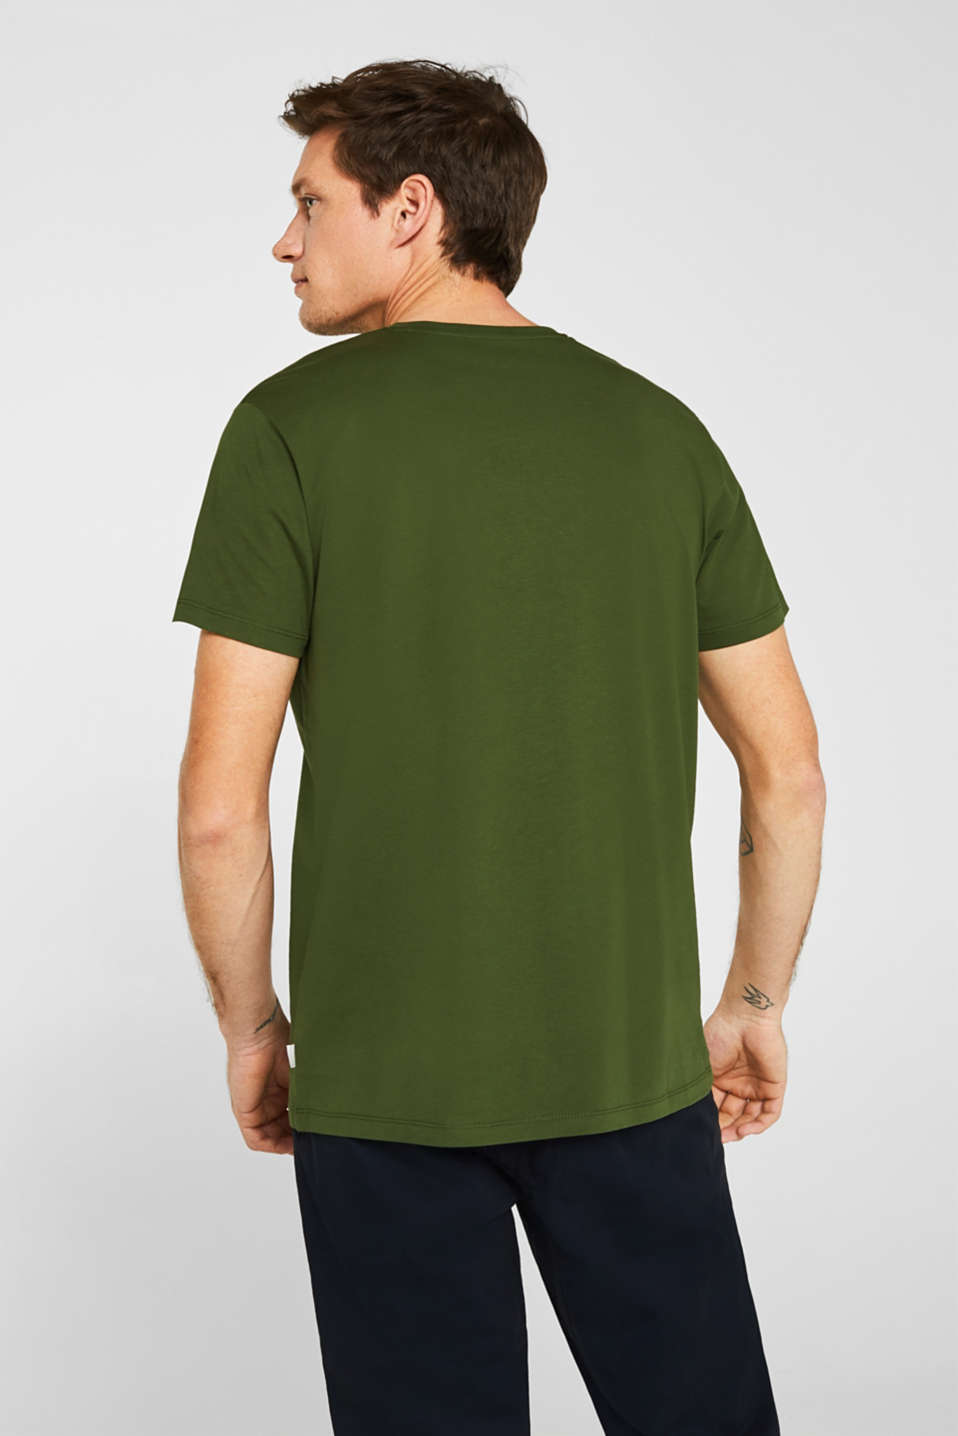 Jersey T-shirt in 100% cotton, KHAKI GREEN, detail image number 3